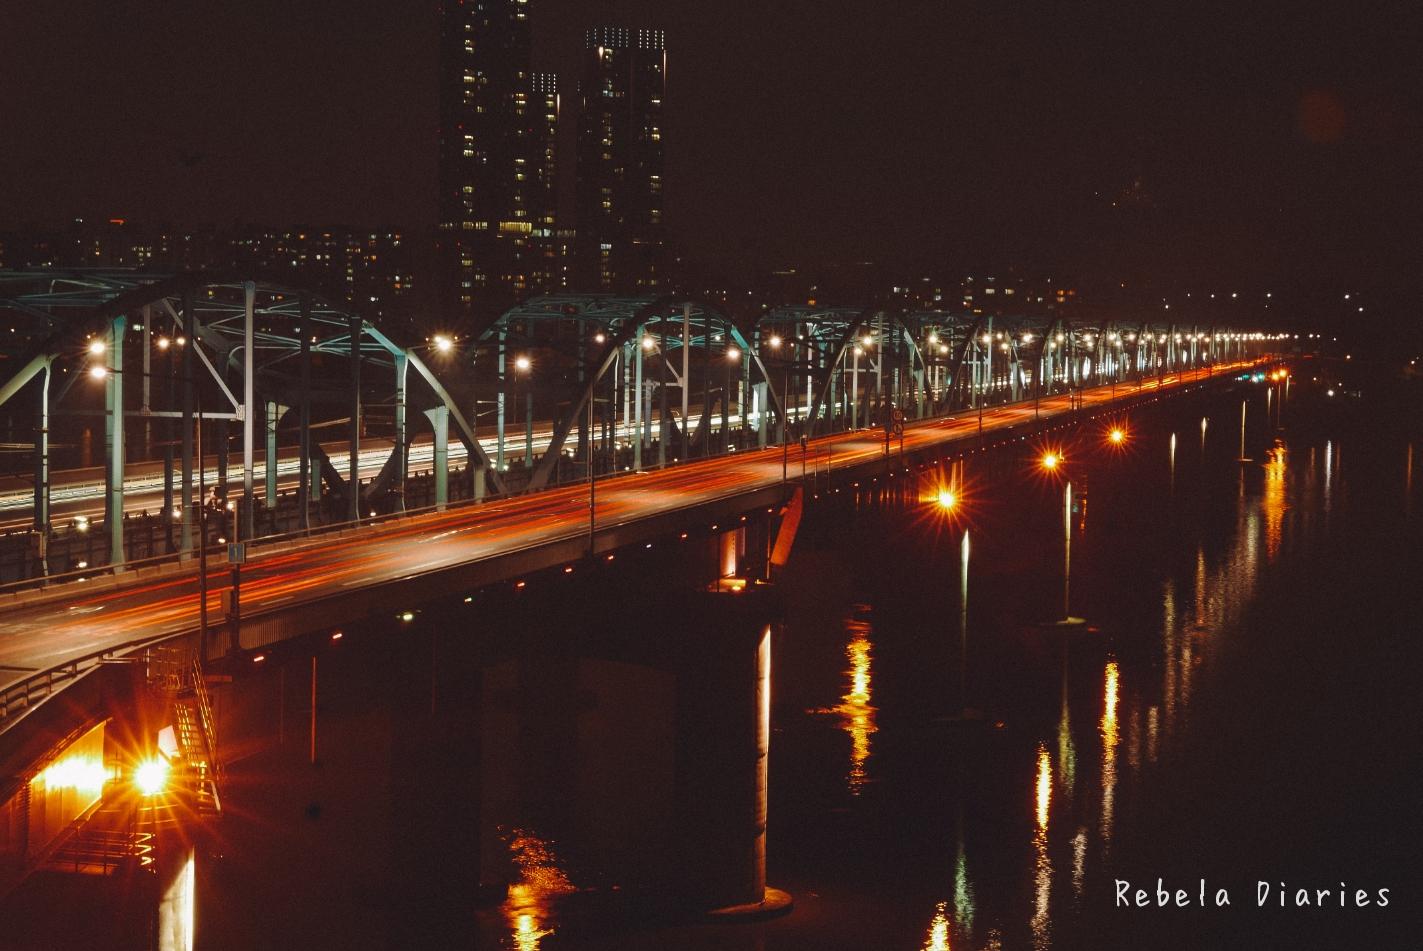 Rebela Diaries: Her Private Life Filming Location Dongjak Bridge